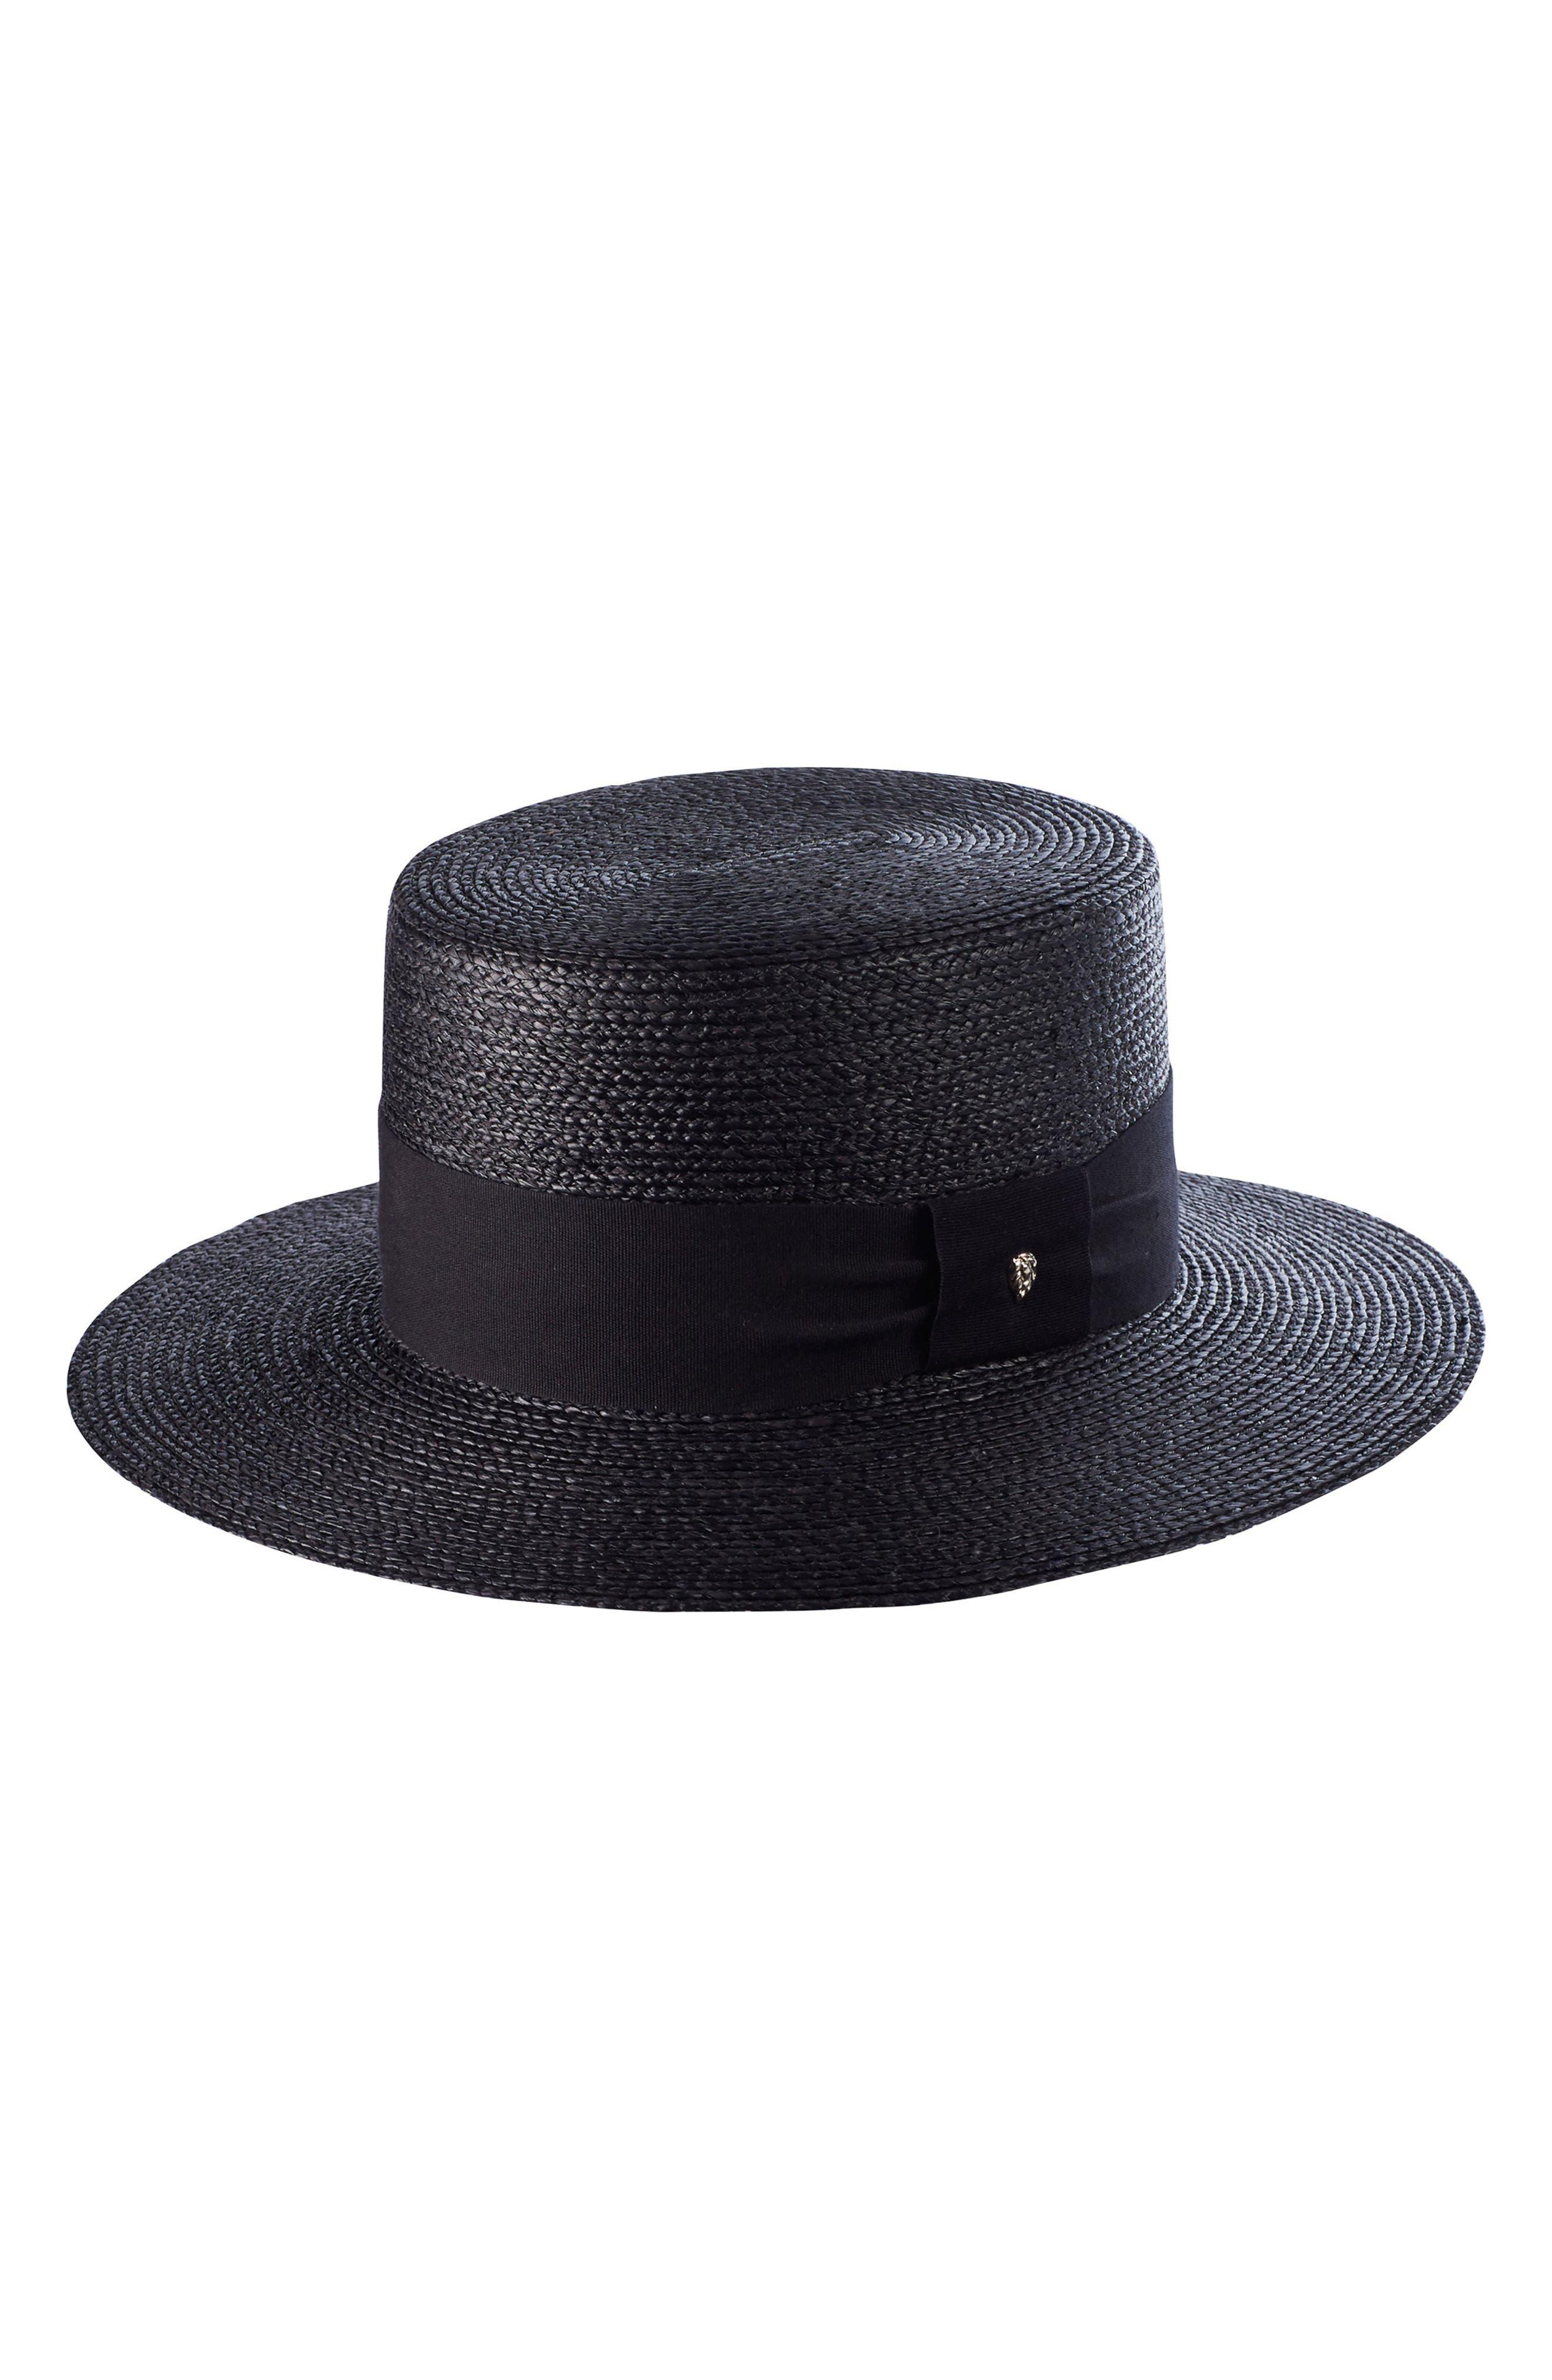 Braided Raffia Boater Hat,                         Main,                         color, 003